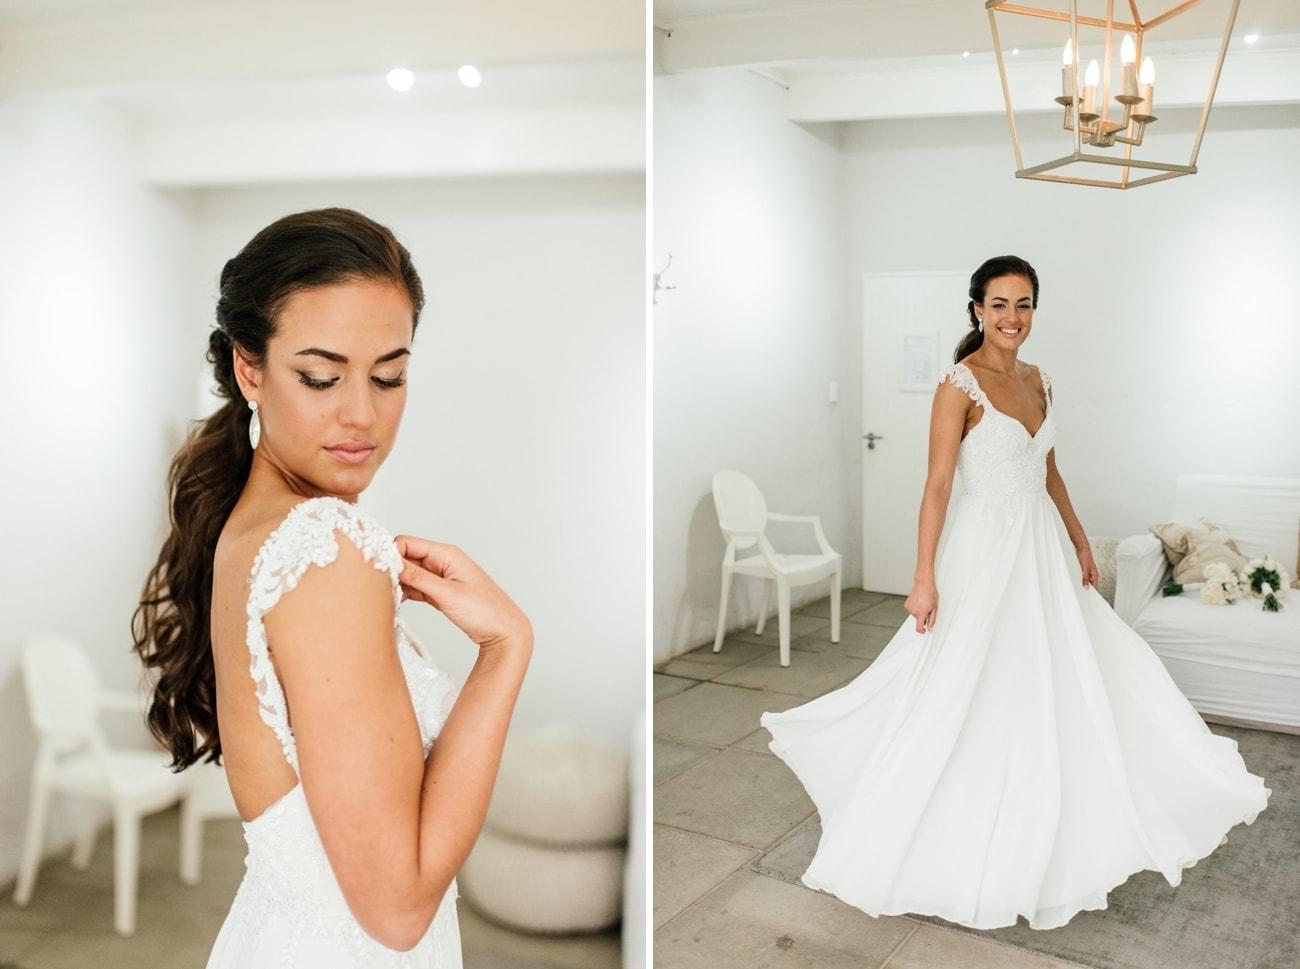 Simple Lace Wedding Dress   Image: Carla Adel